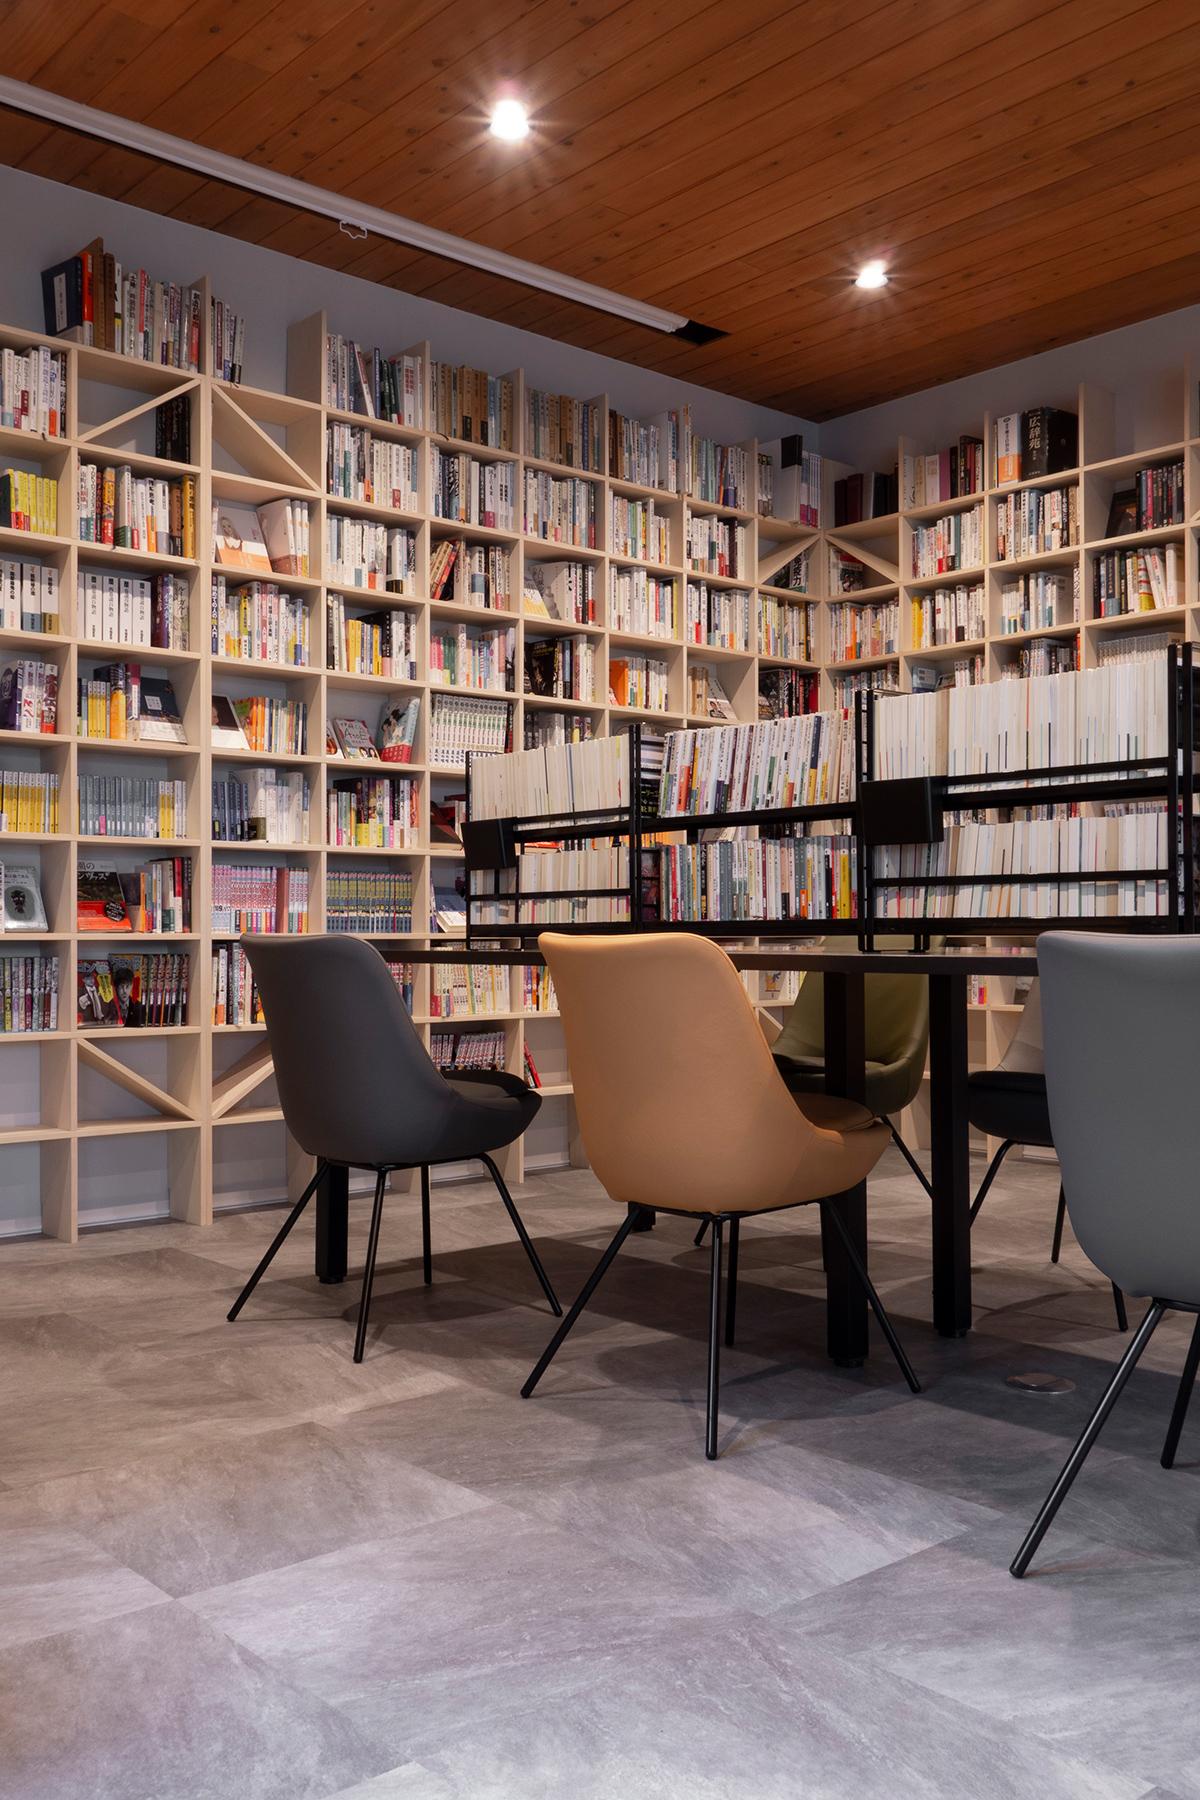 Jaja'sプロジェクト「私設図書館」- その1 | 壁一面のA5判本棚 奥行180mm / Shelf (No.09) | マルゲリータ使用例 シンプル おしゃれ 部屋 インテリア レイアウト